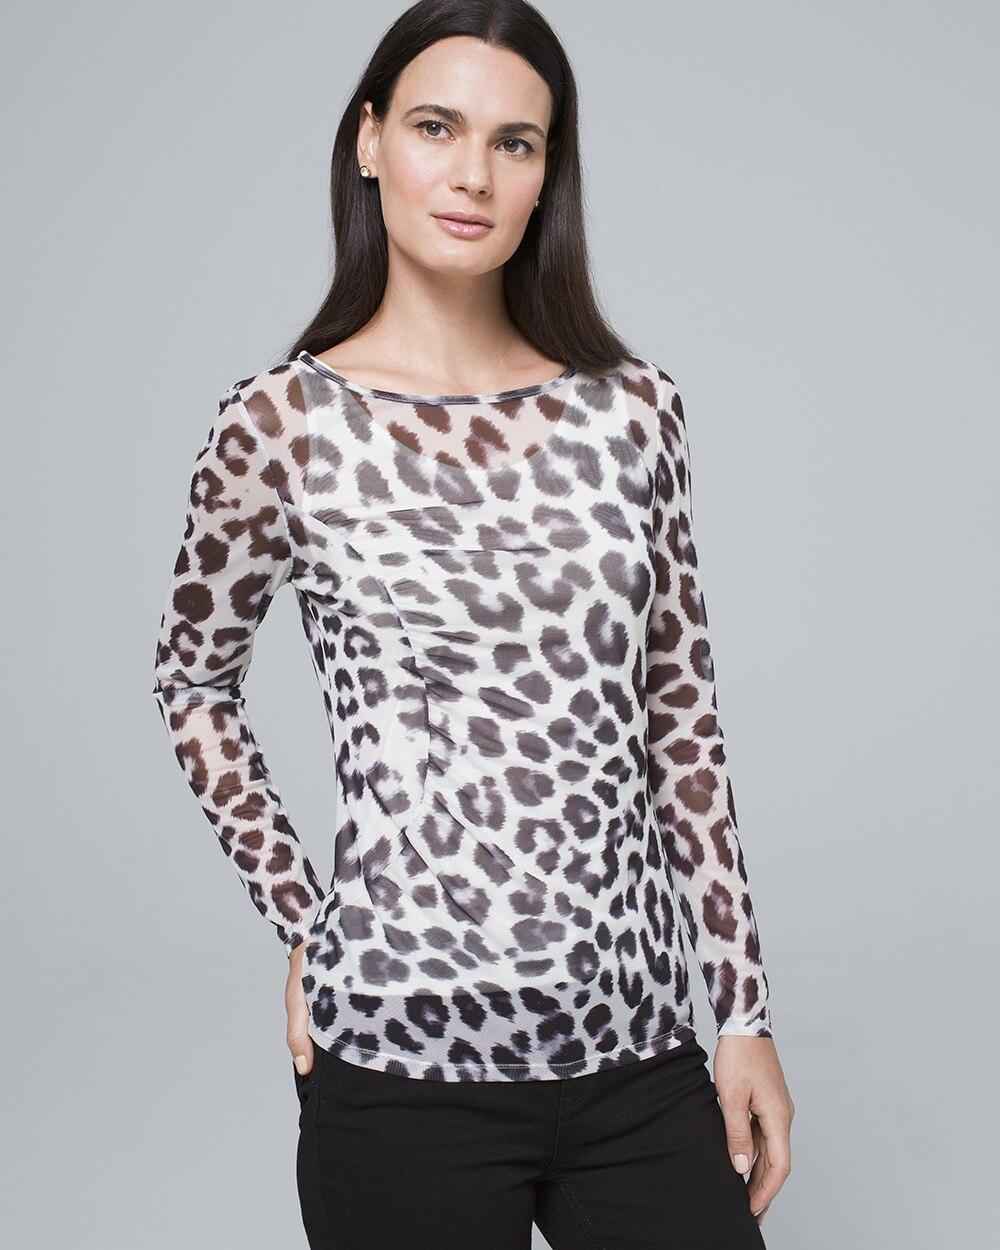 3da18d972072 Leopard-Print Mesh Top - White House Black Market